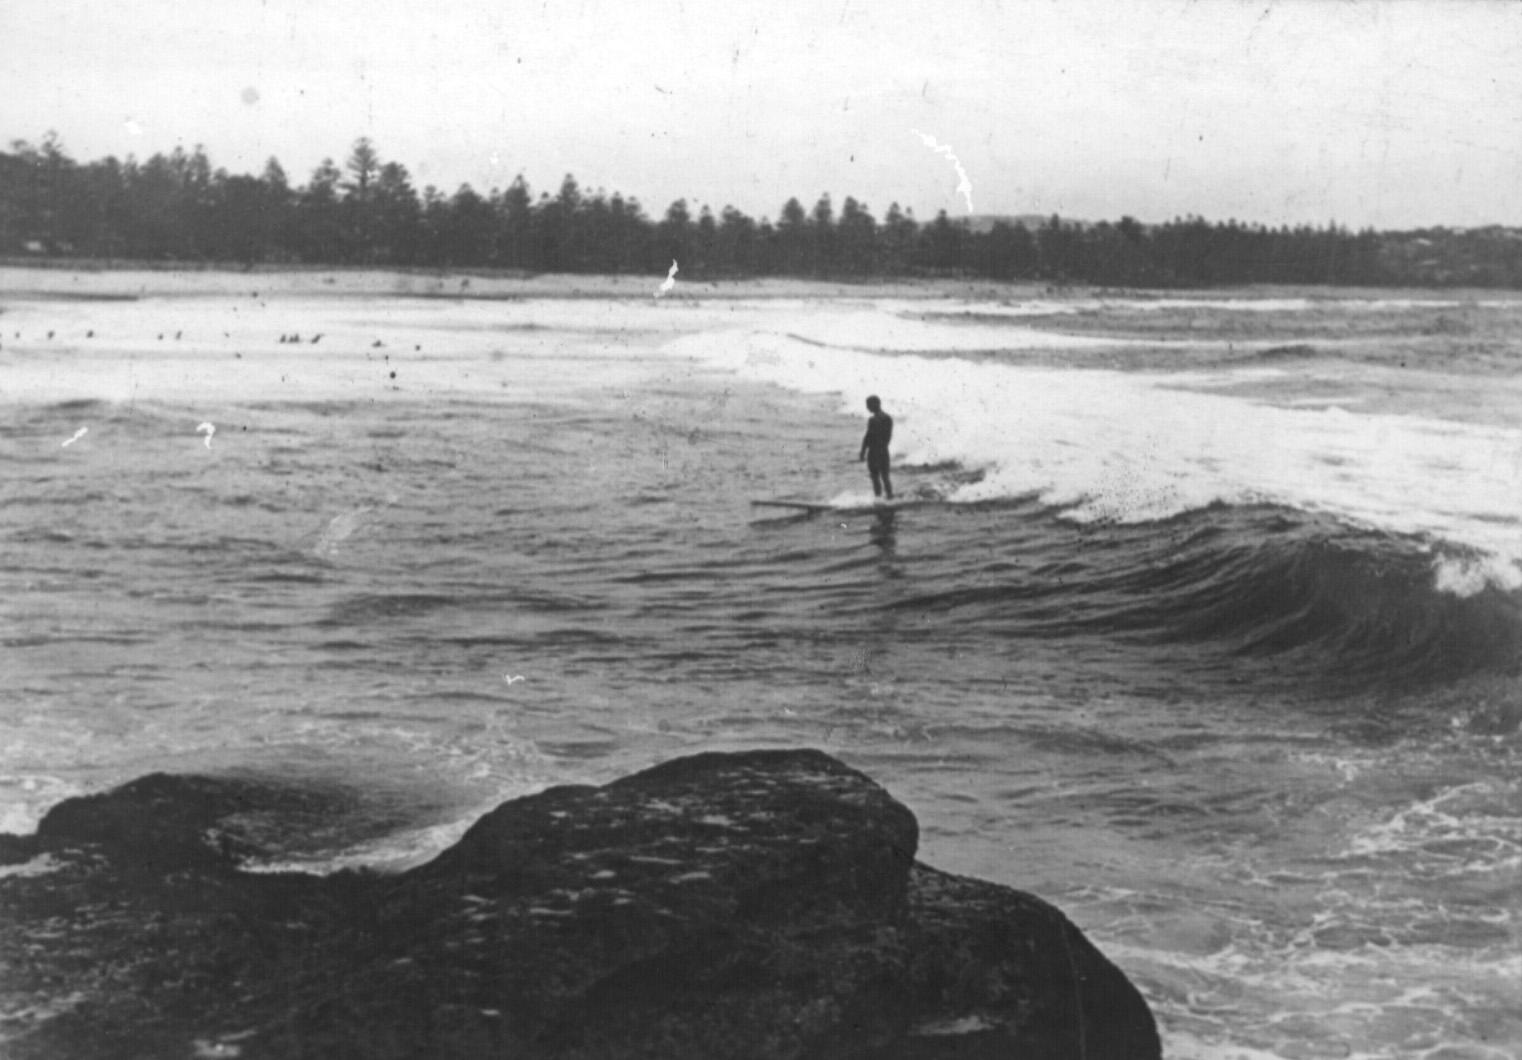 AUSTRALIA'S SURFING STORY